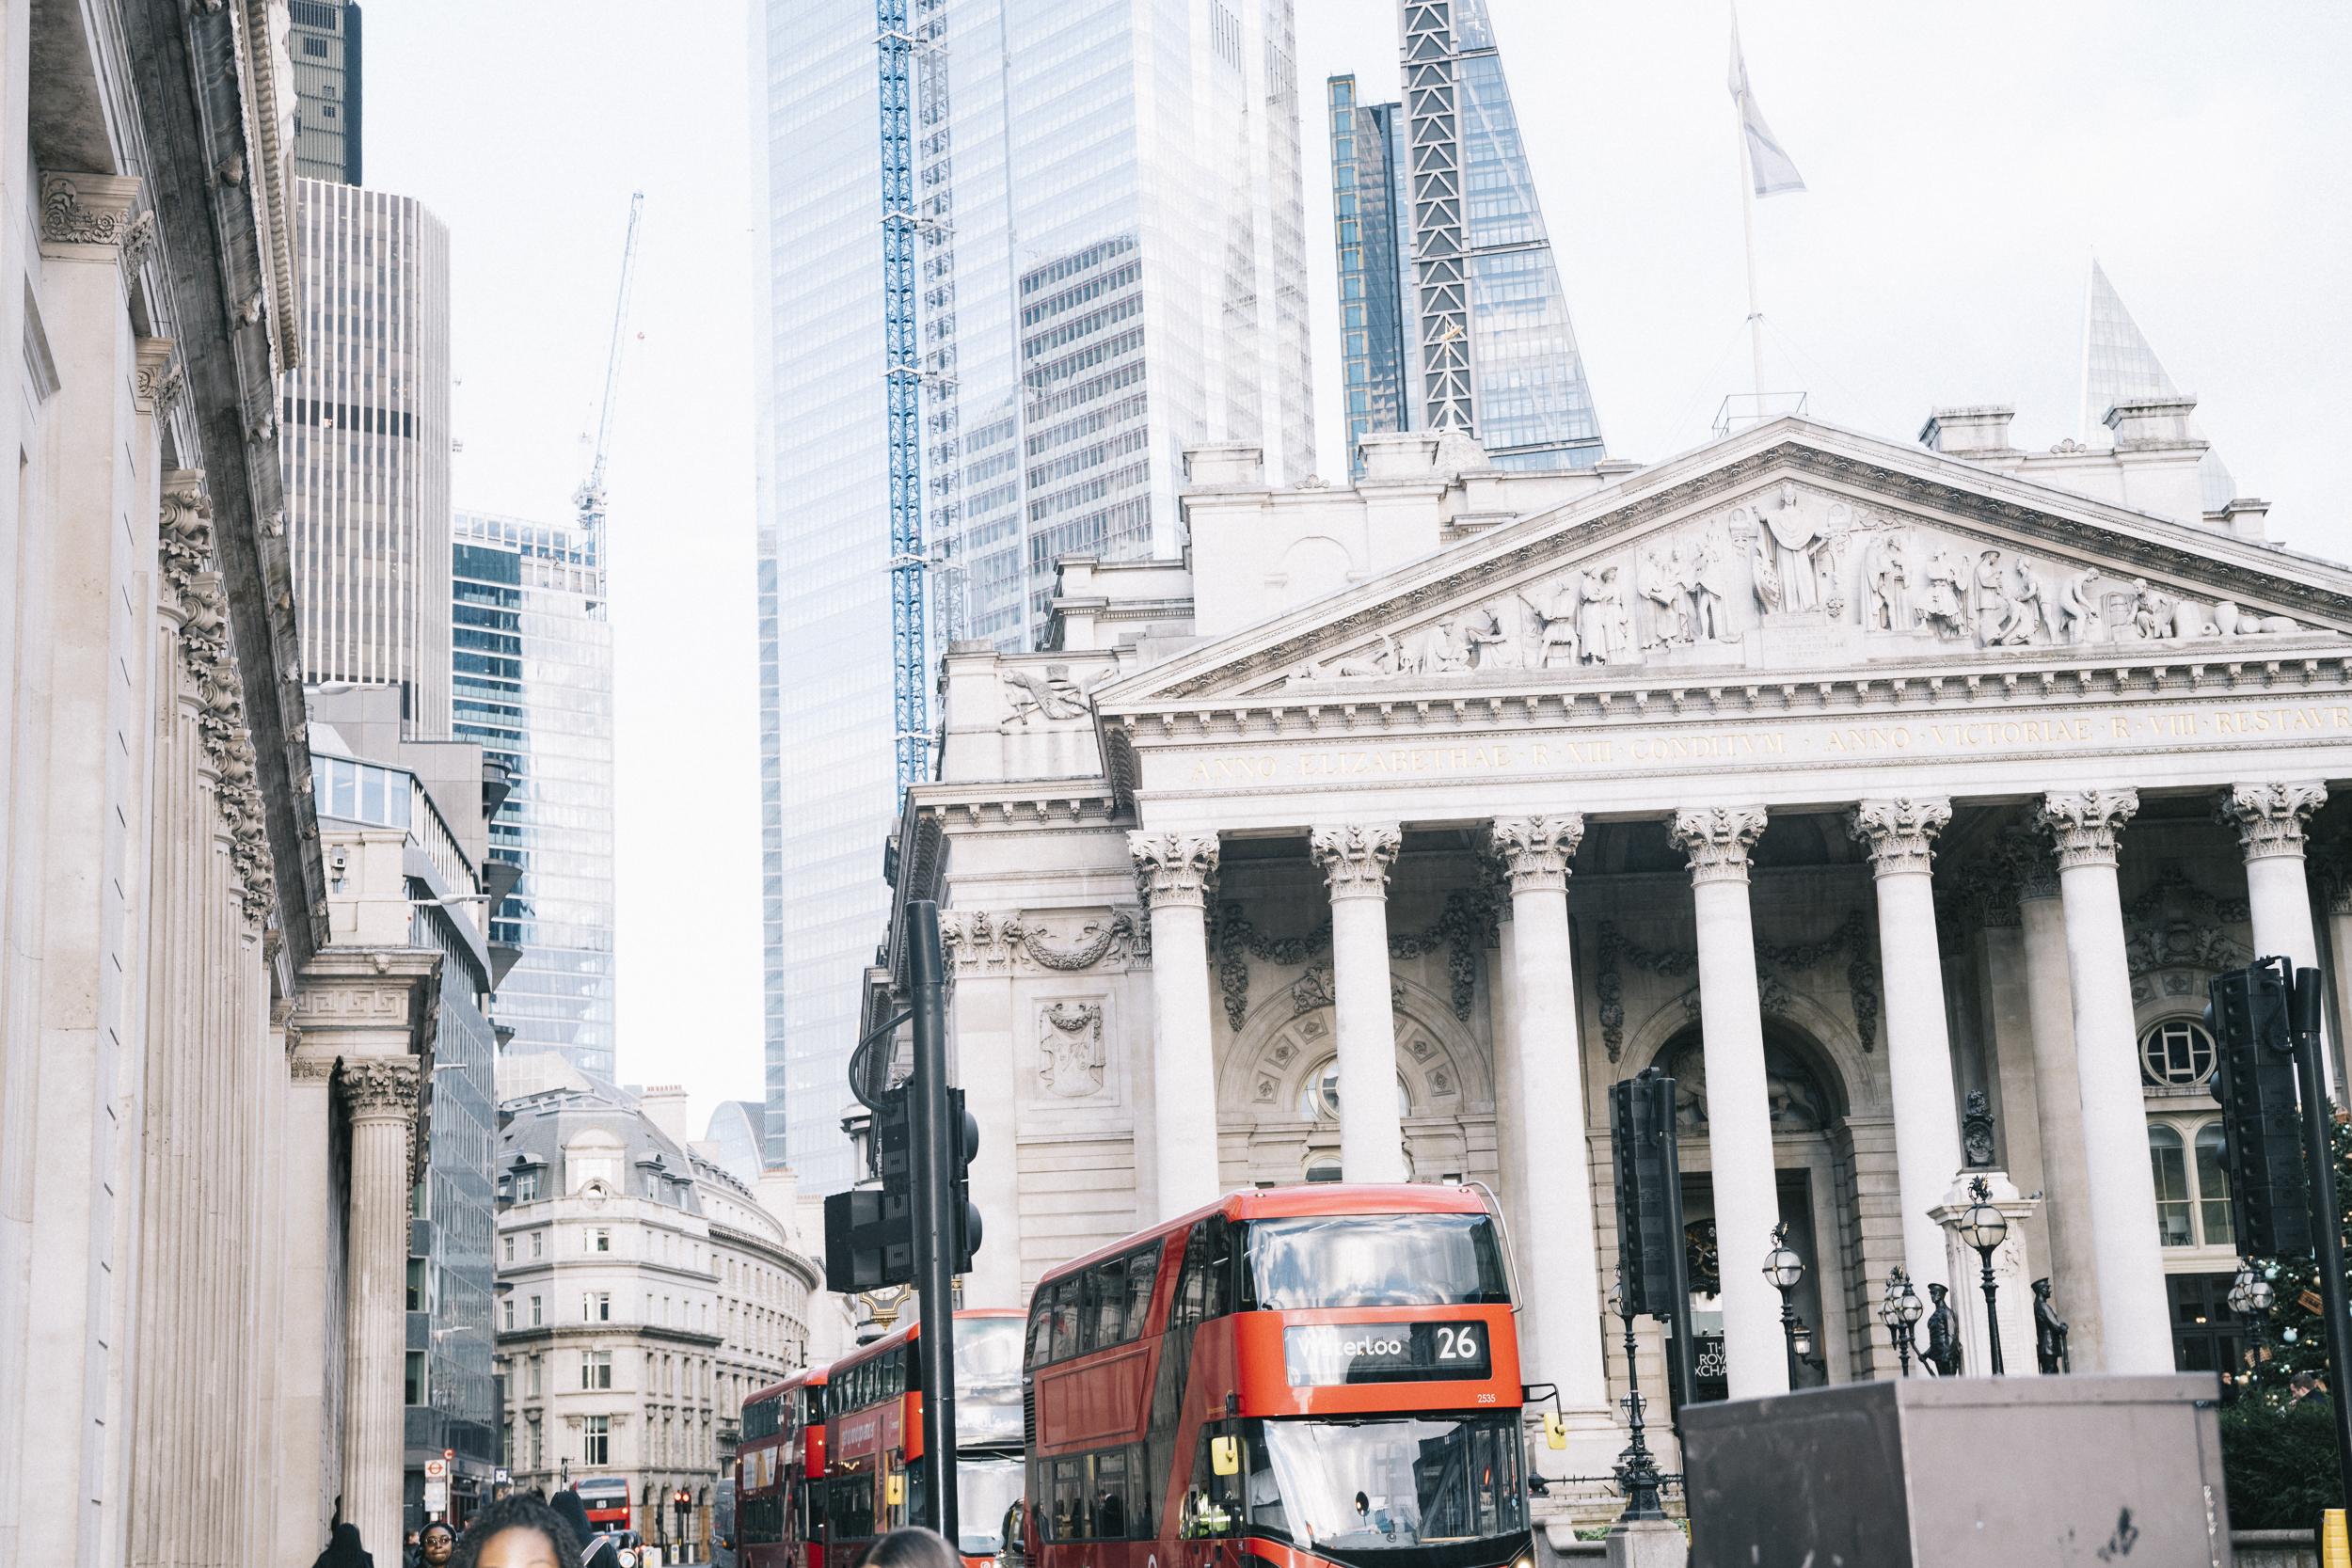 london_21_web.jpg